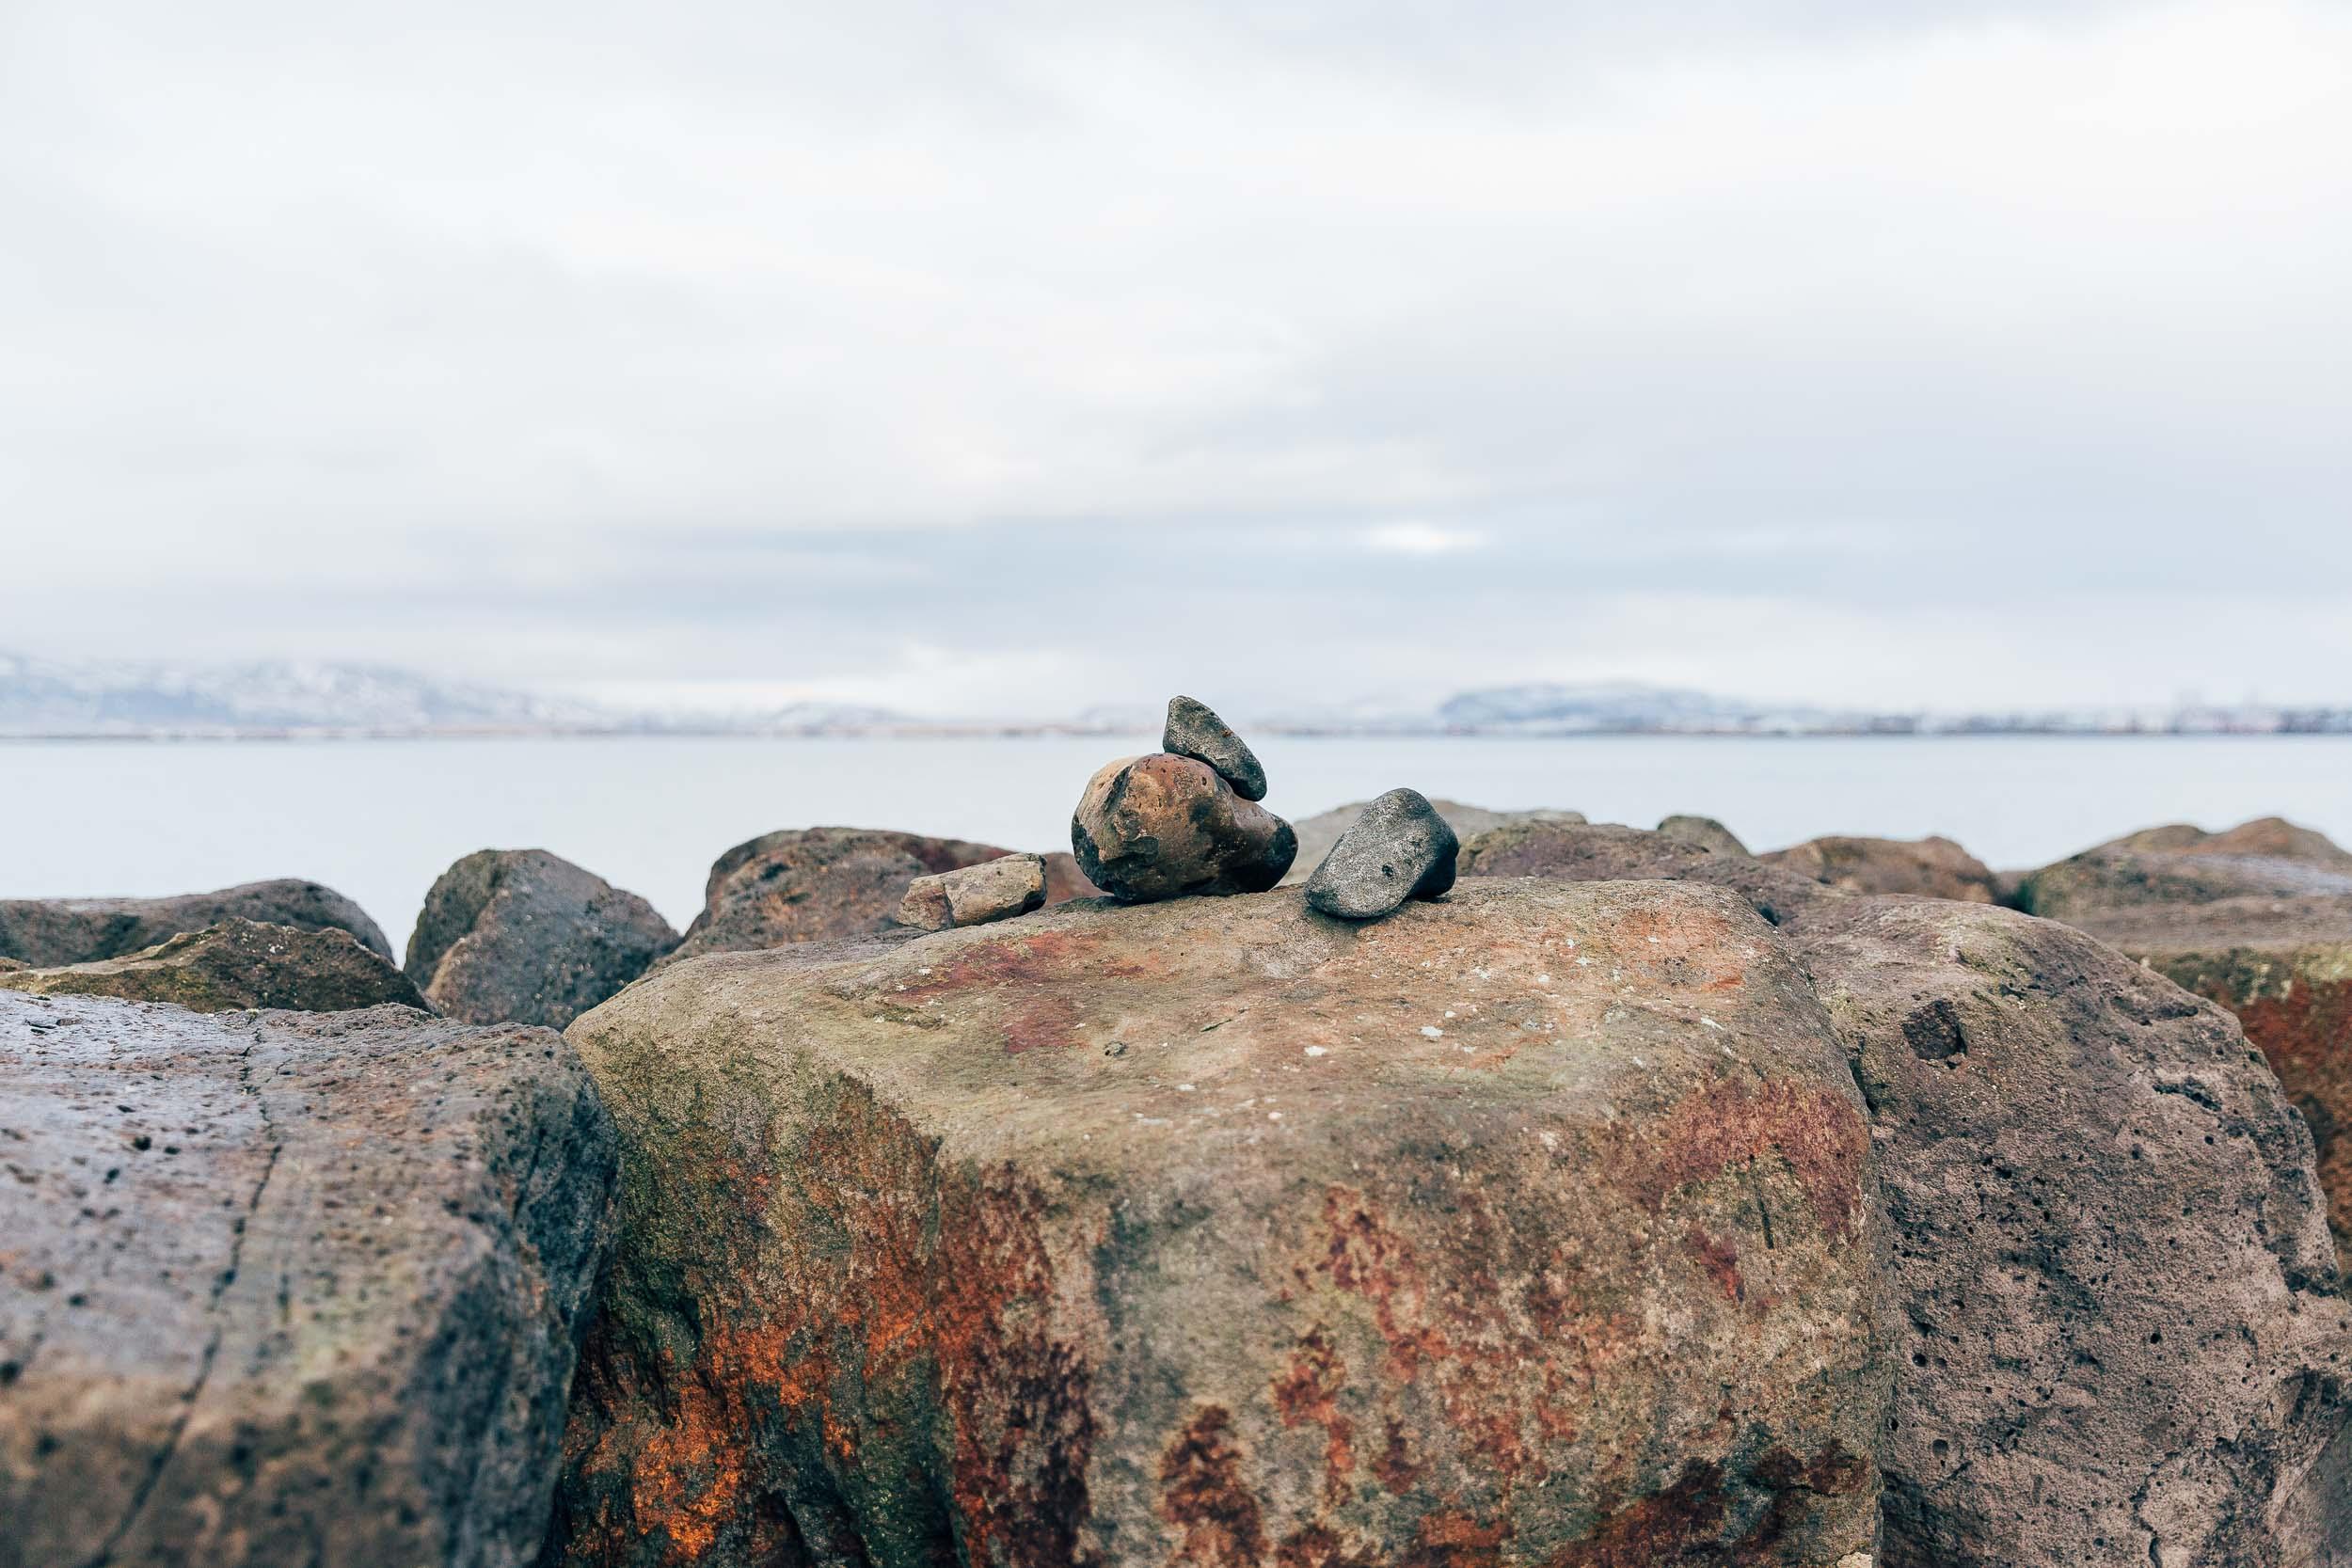 02_2019_Iceland-156.jpg